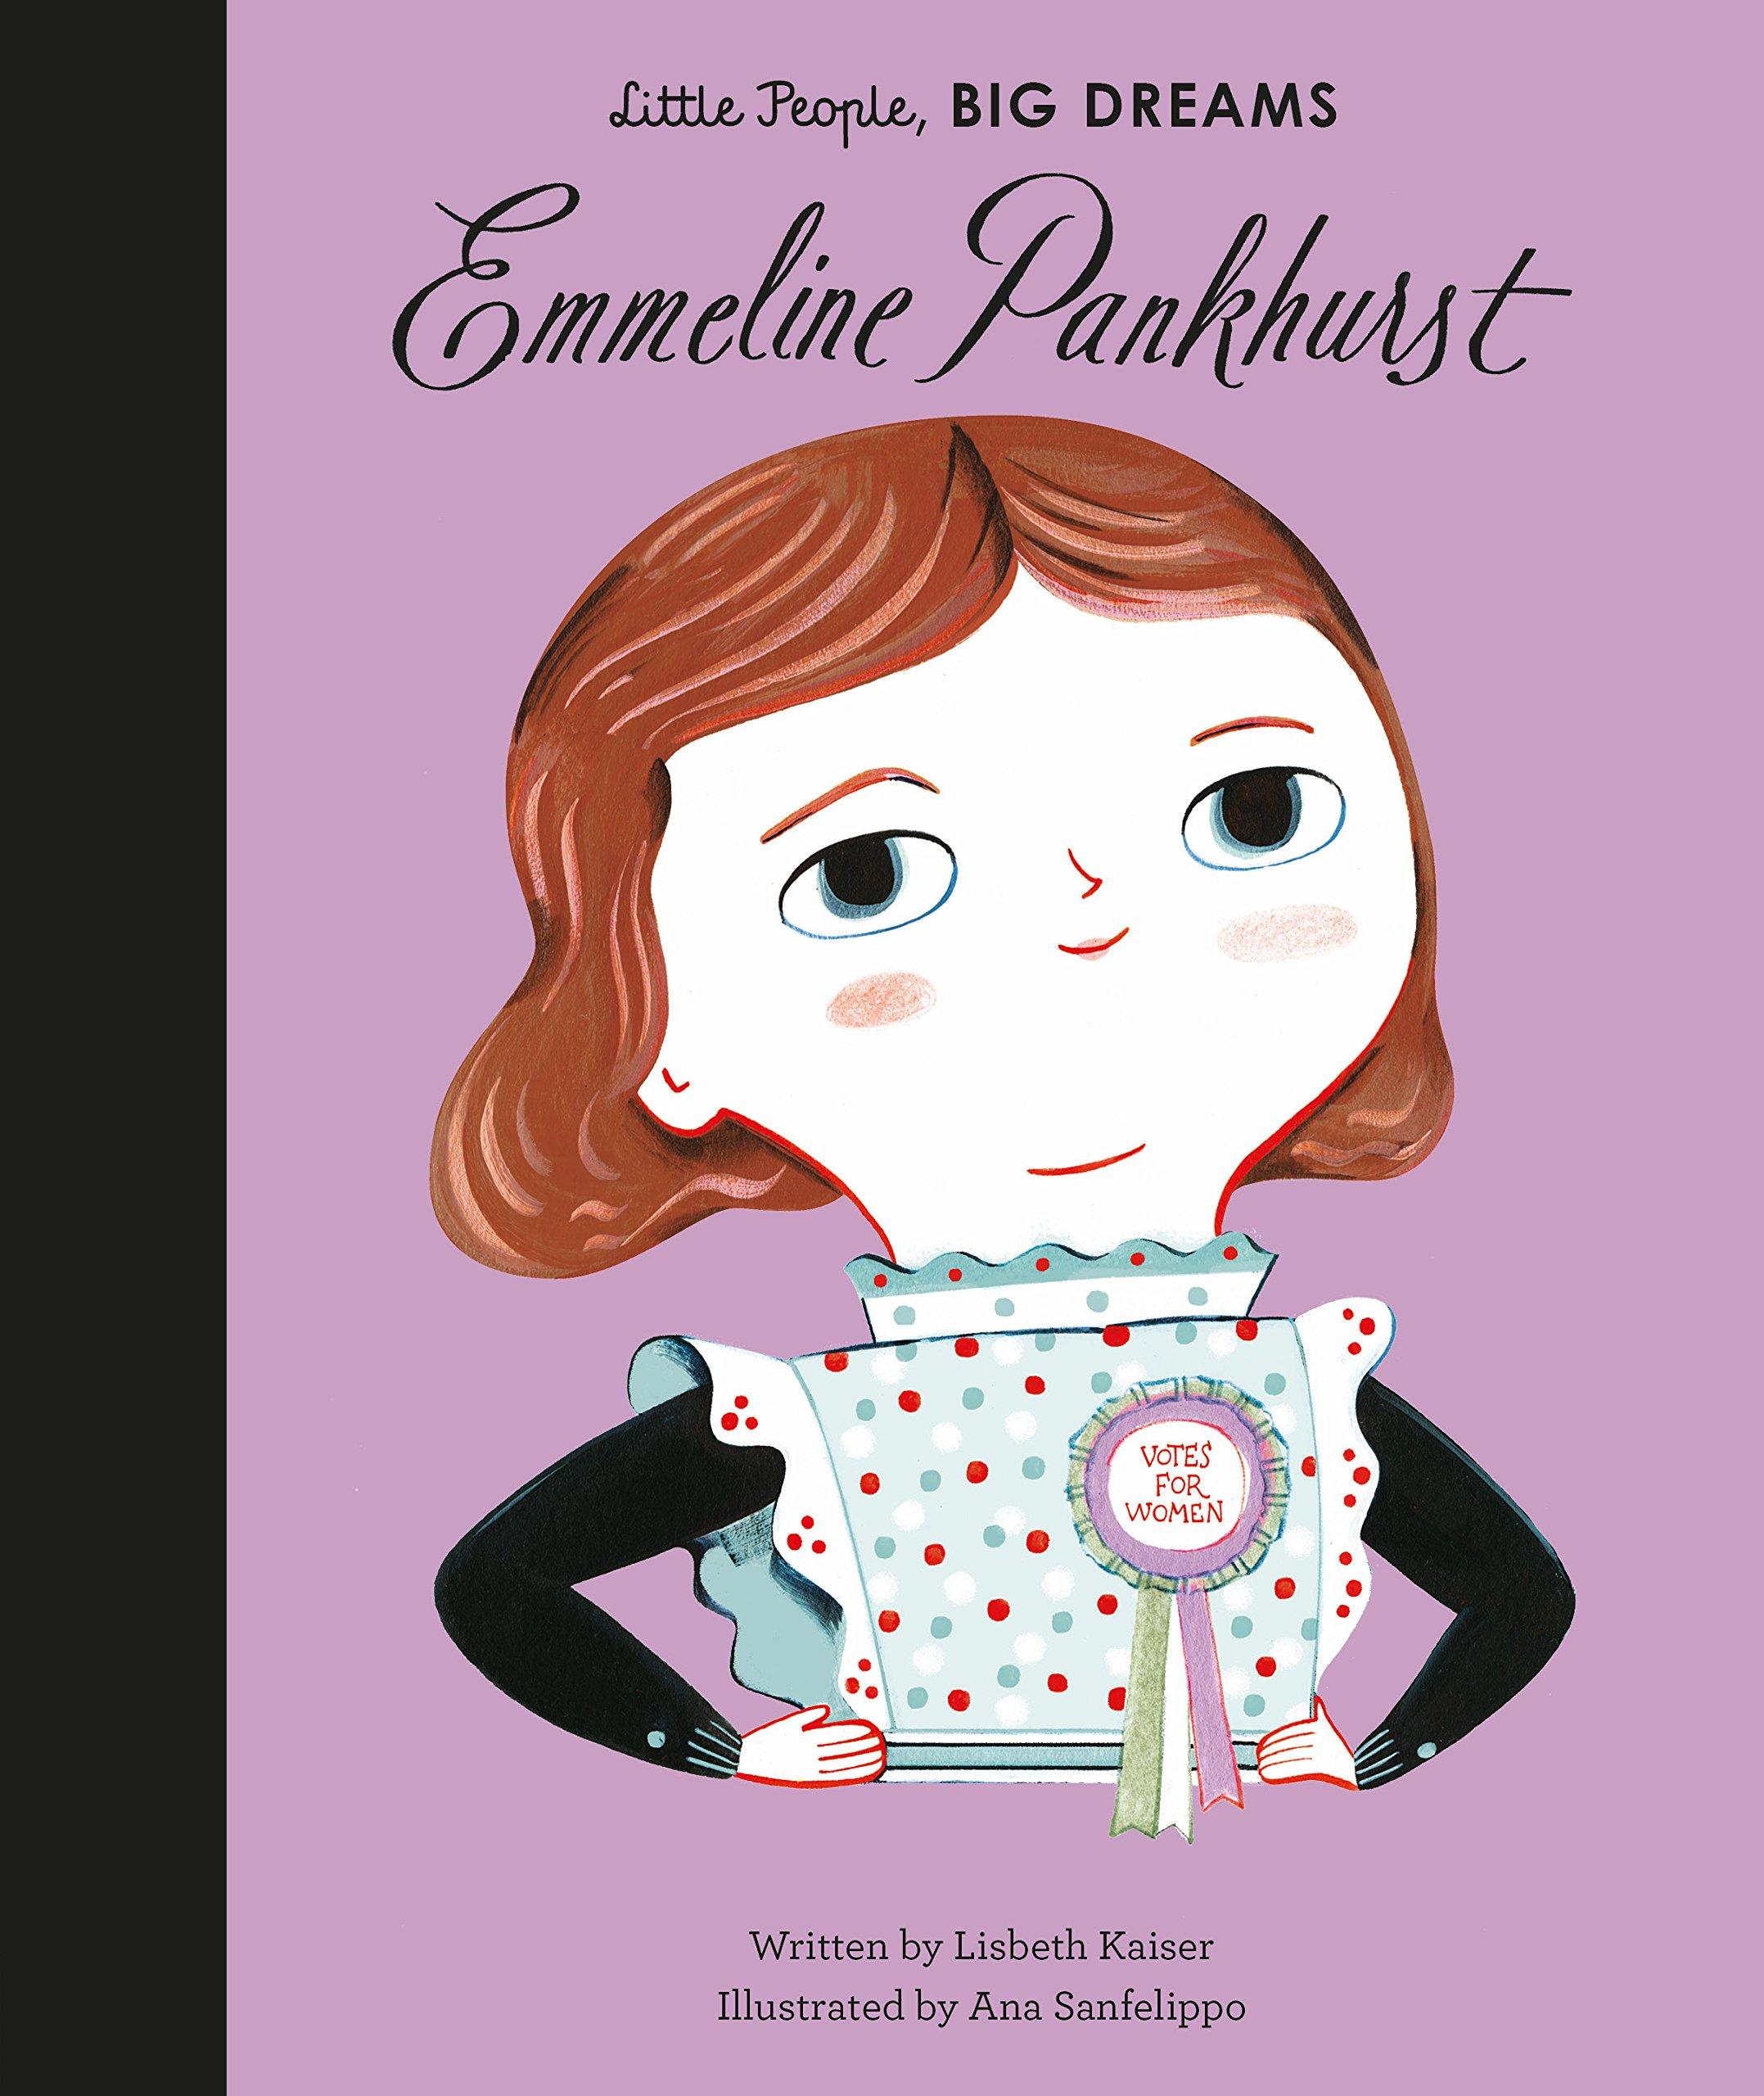 Emmeline Pankhurst: 8 (Little People, Big Dreams): Amazon.co.uk: Kaiser,  Lisbeth, Sanfelippo, Ana: Books